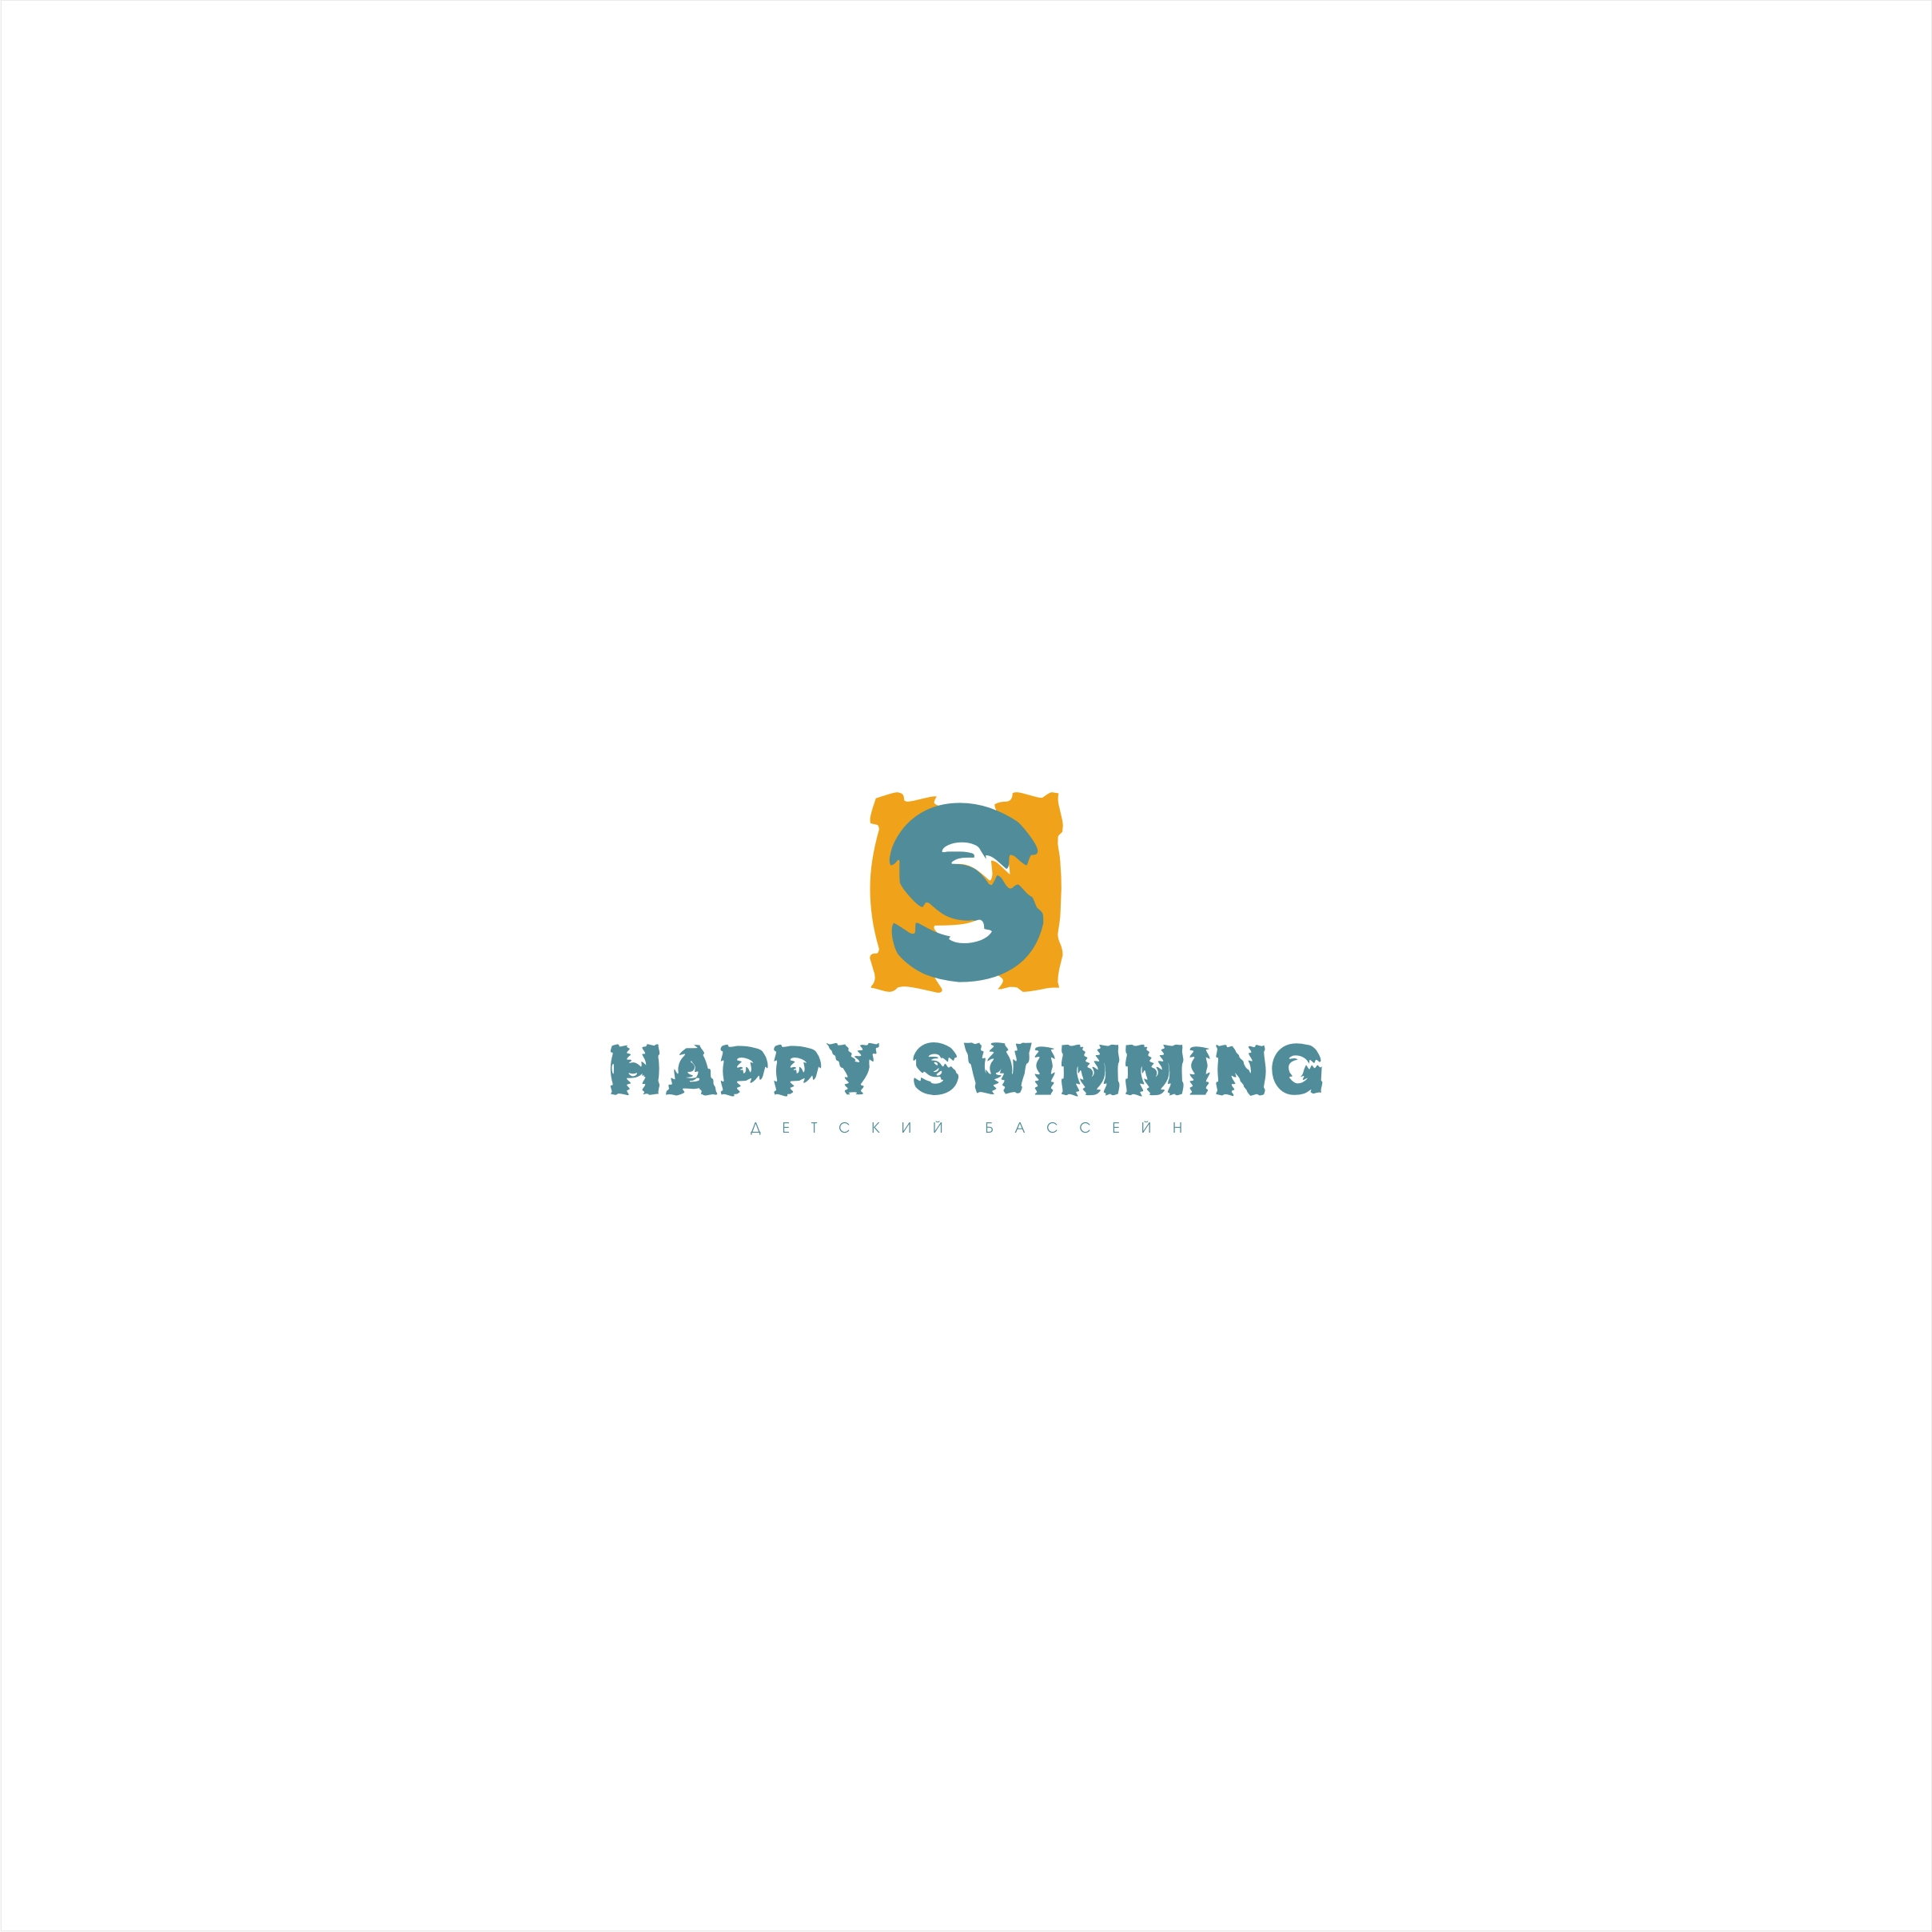 Логотип для  детского бассейна. фото f_8265c73bf7a95992.jpg